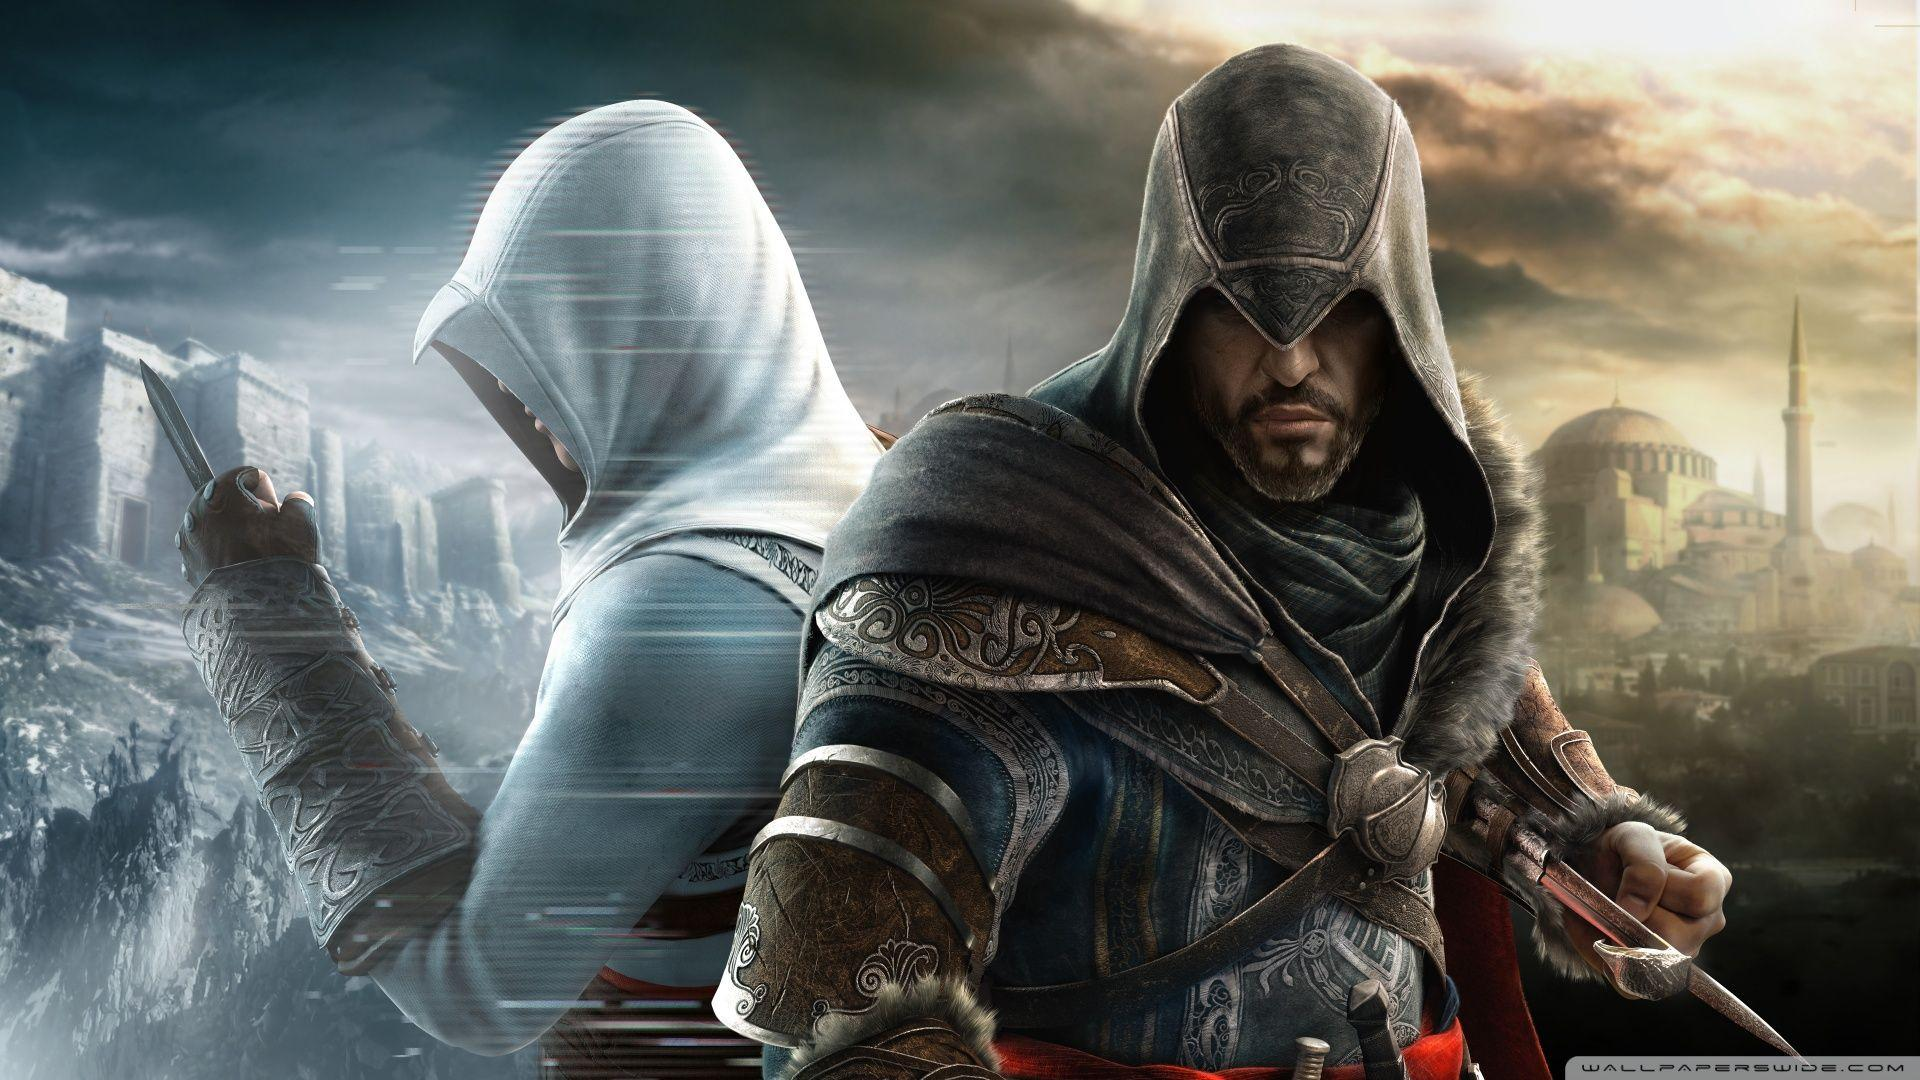 assassins creed revelations wallpaper hd 1080p free download